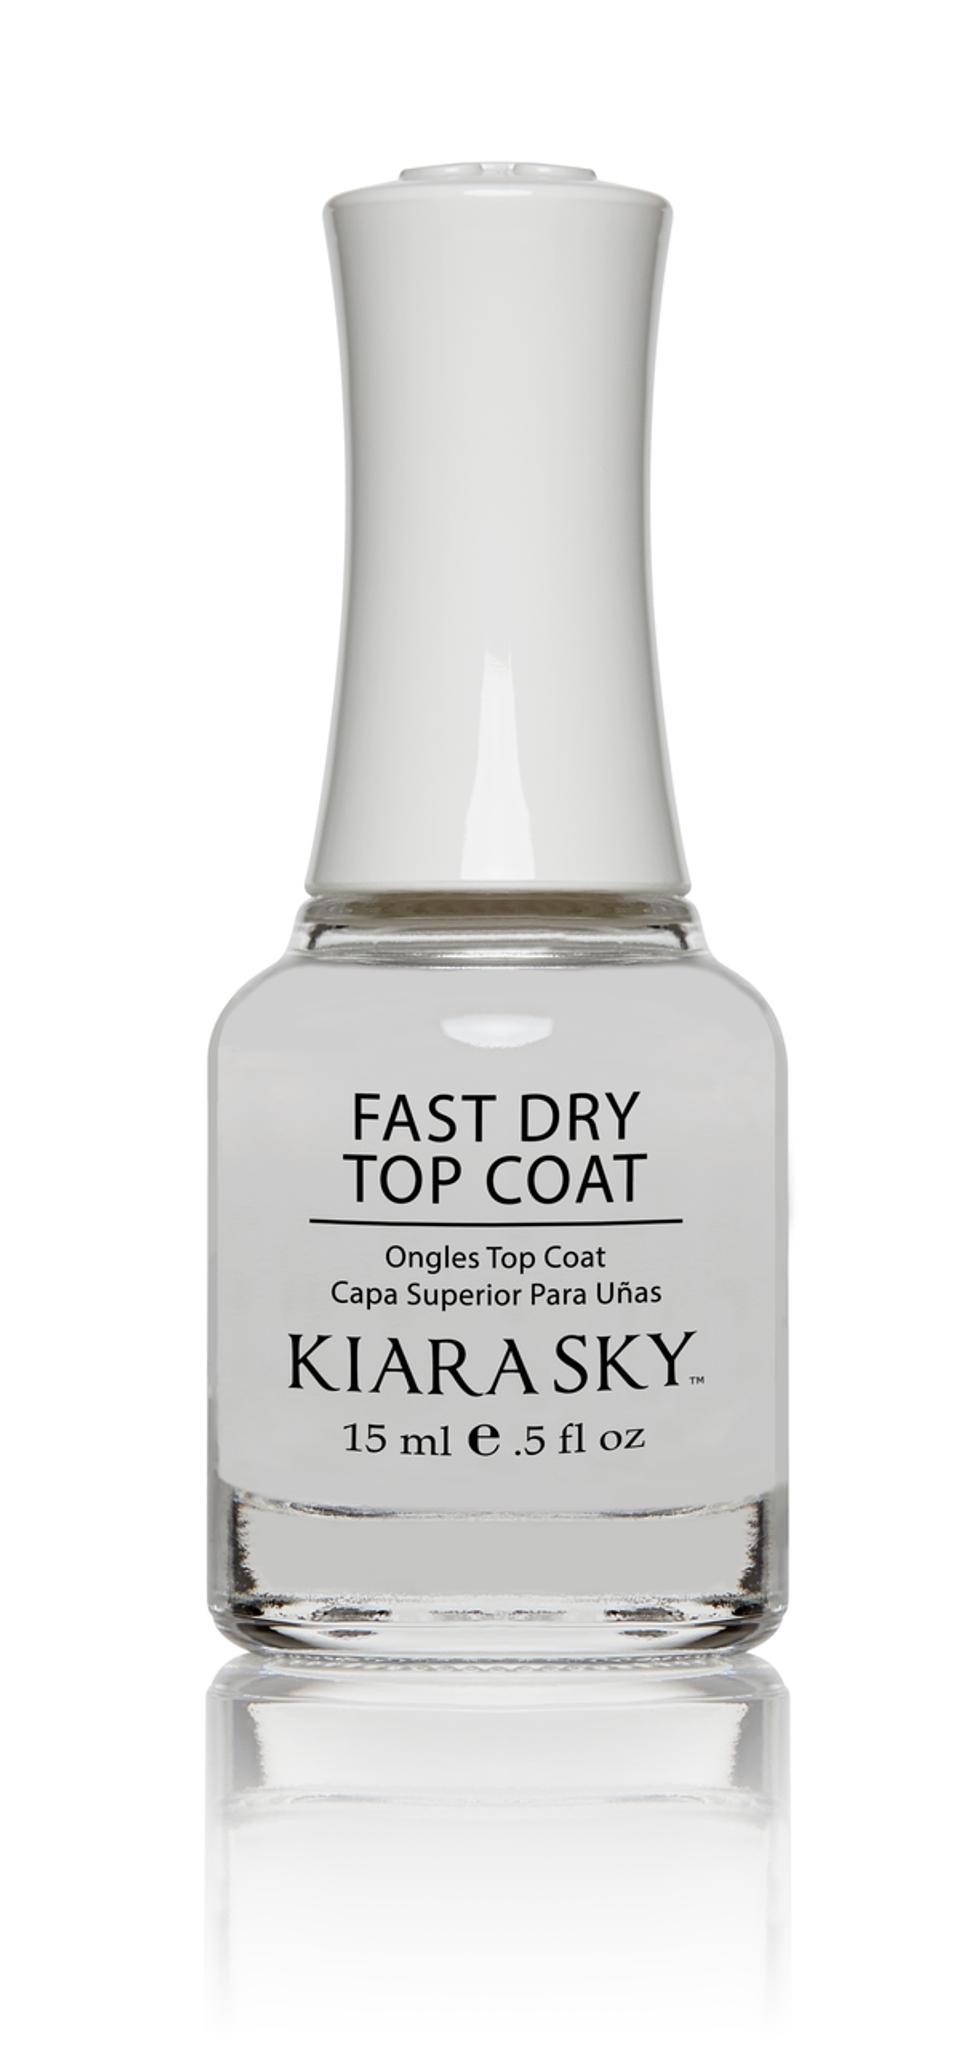 NAIL LACQUER TOP COAT - FAST DRY - Kiara Sky Professional Nails